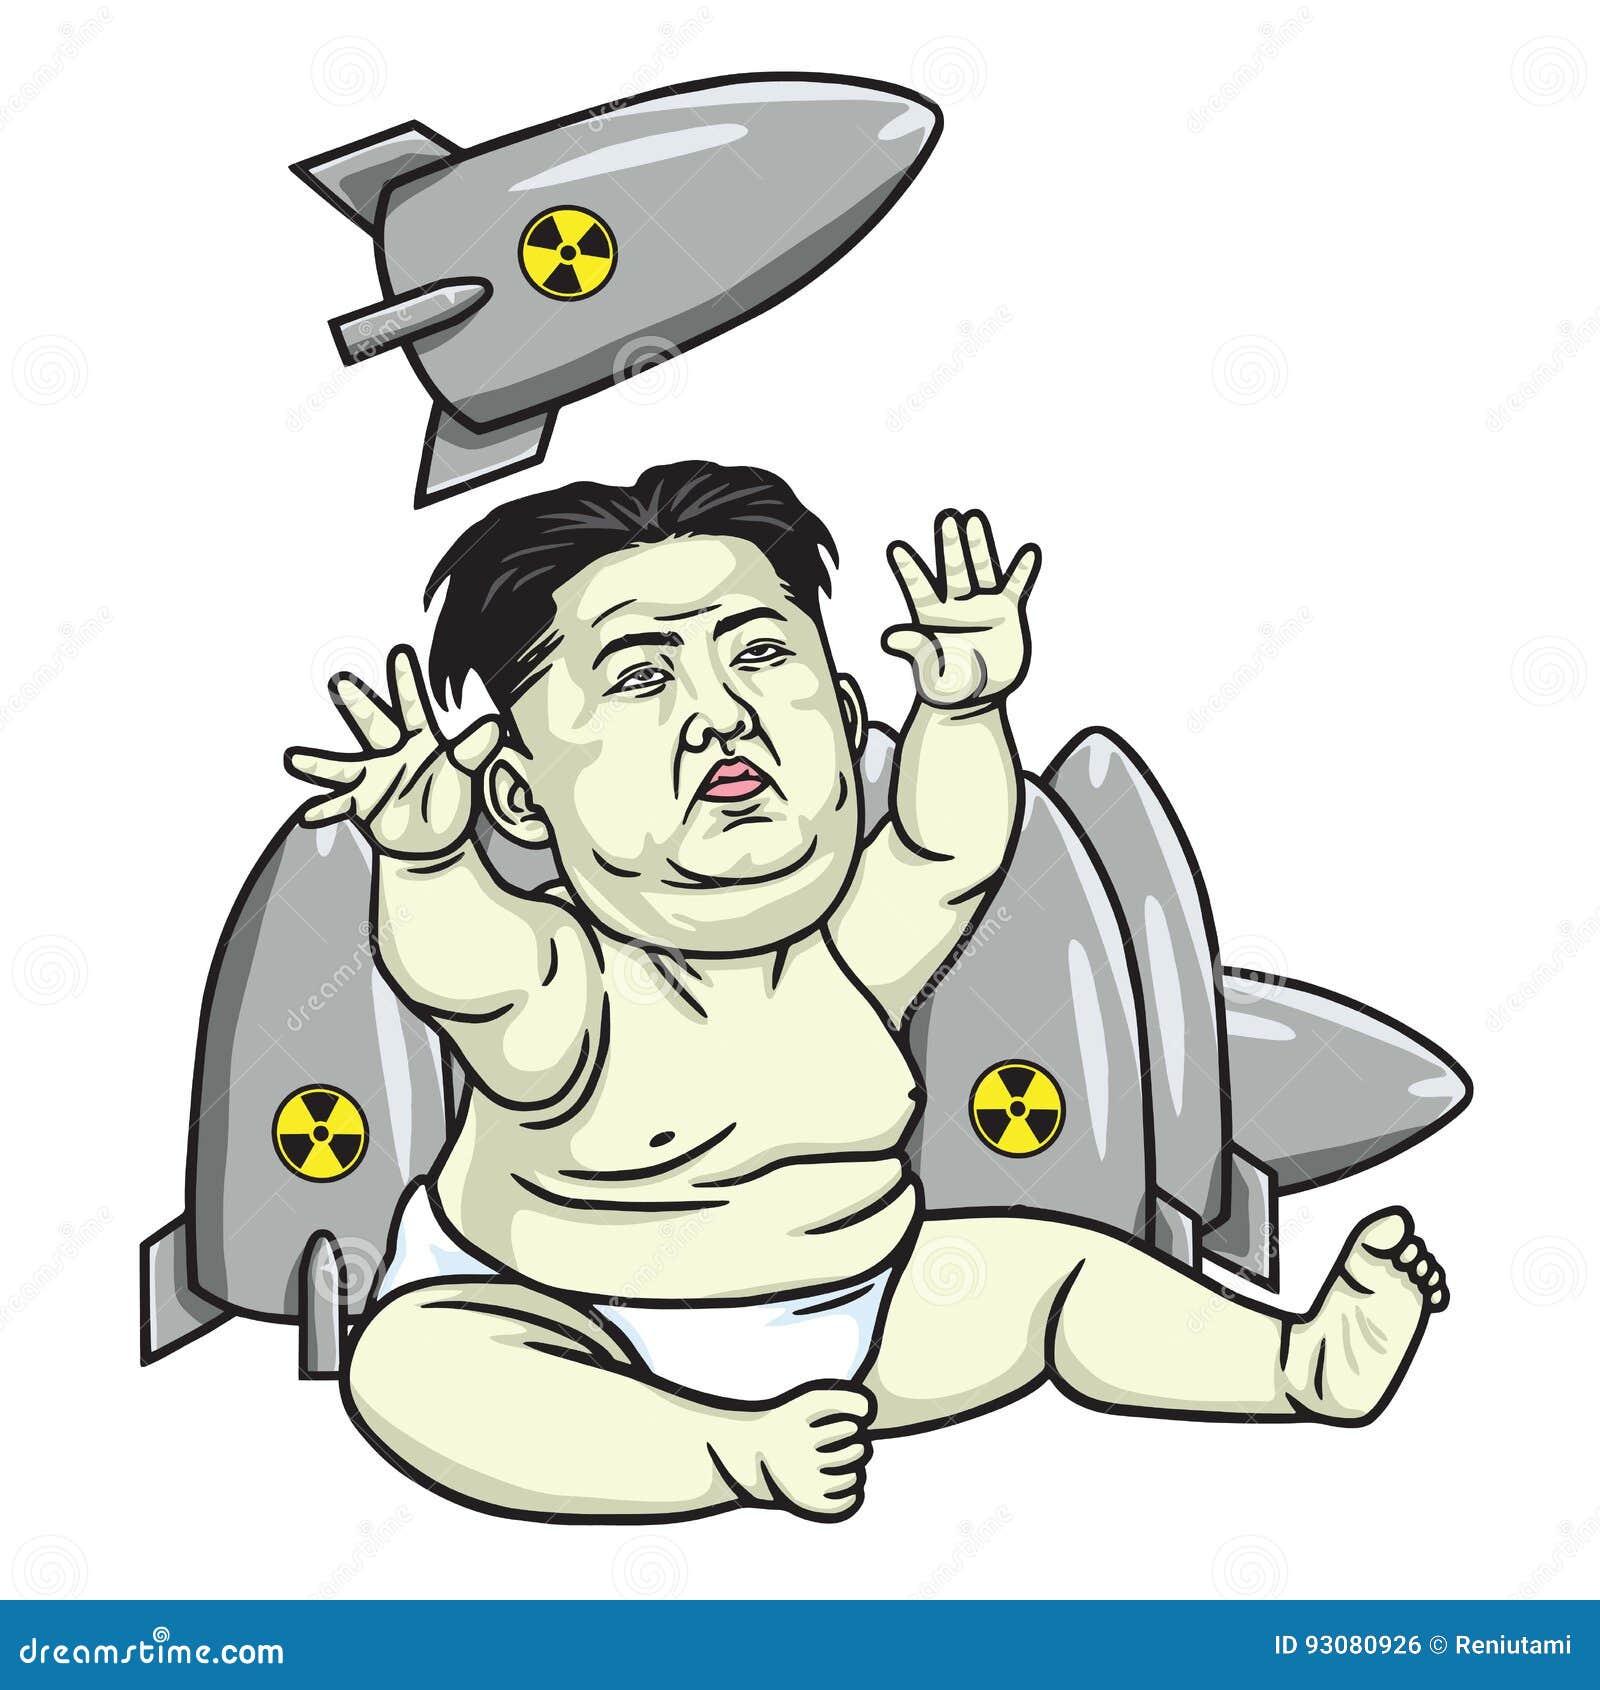 Kim Jong Un Playing Missiles Cartoon Vector Illustration May